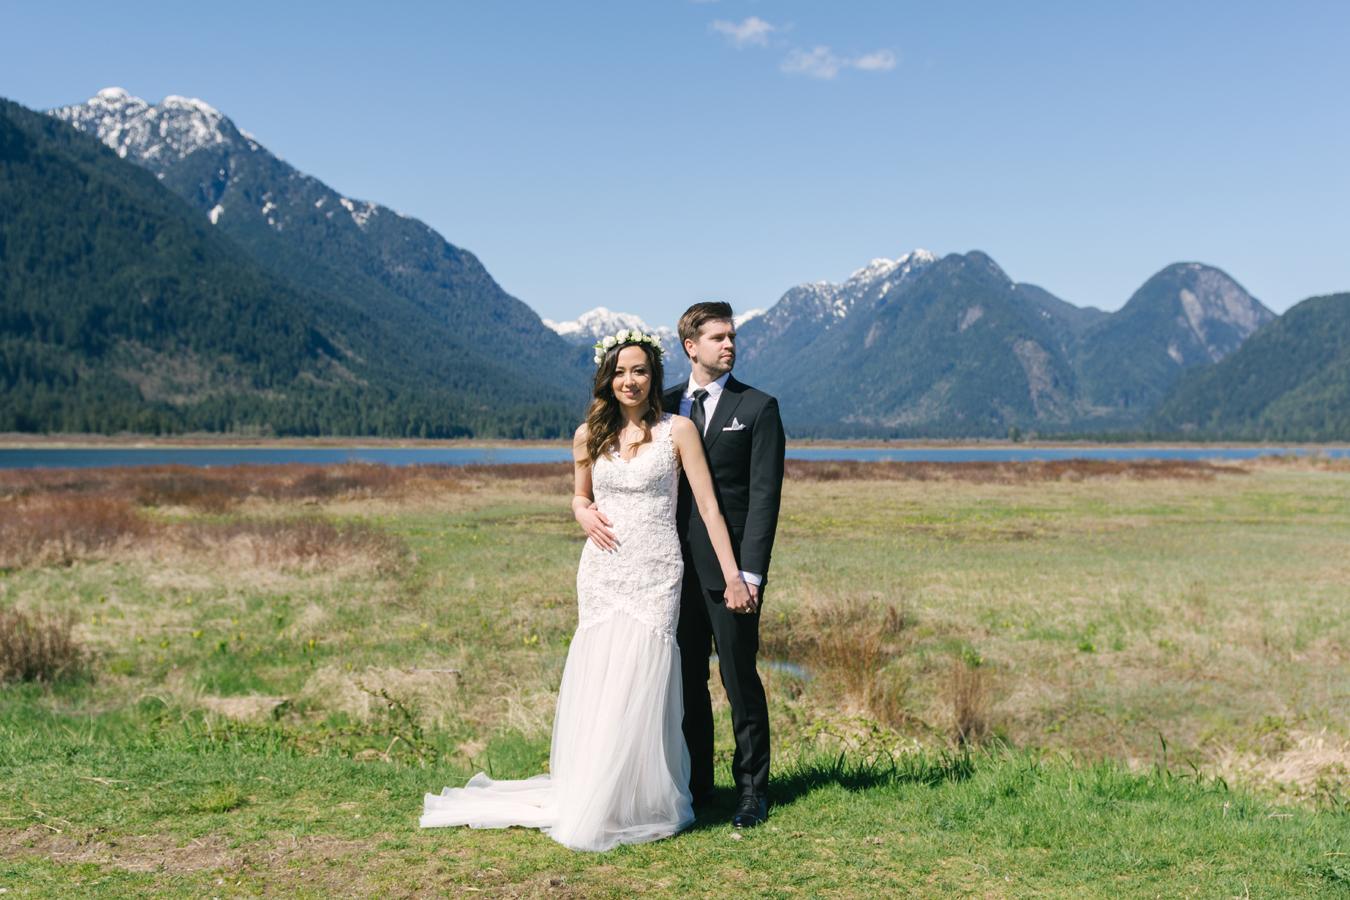 vanouver-wedding-portraits-18.jpg